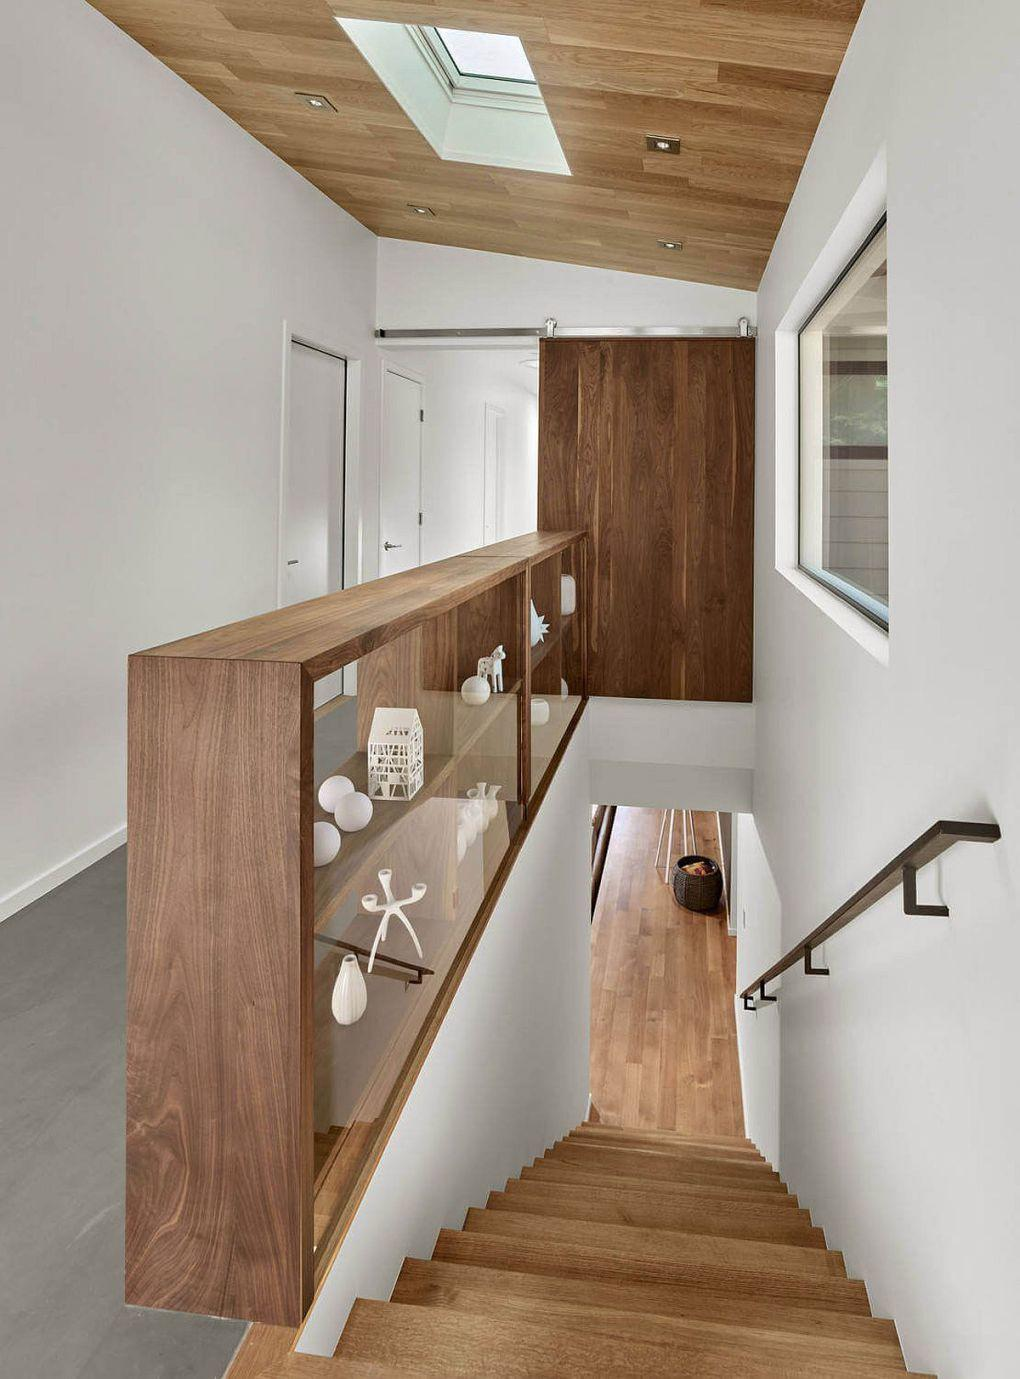 Kaliforniya Evleri | Wooden shelf next to the staircase also doubles as a railing 1